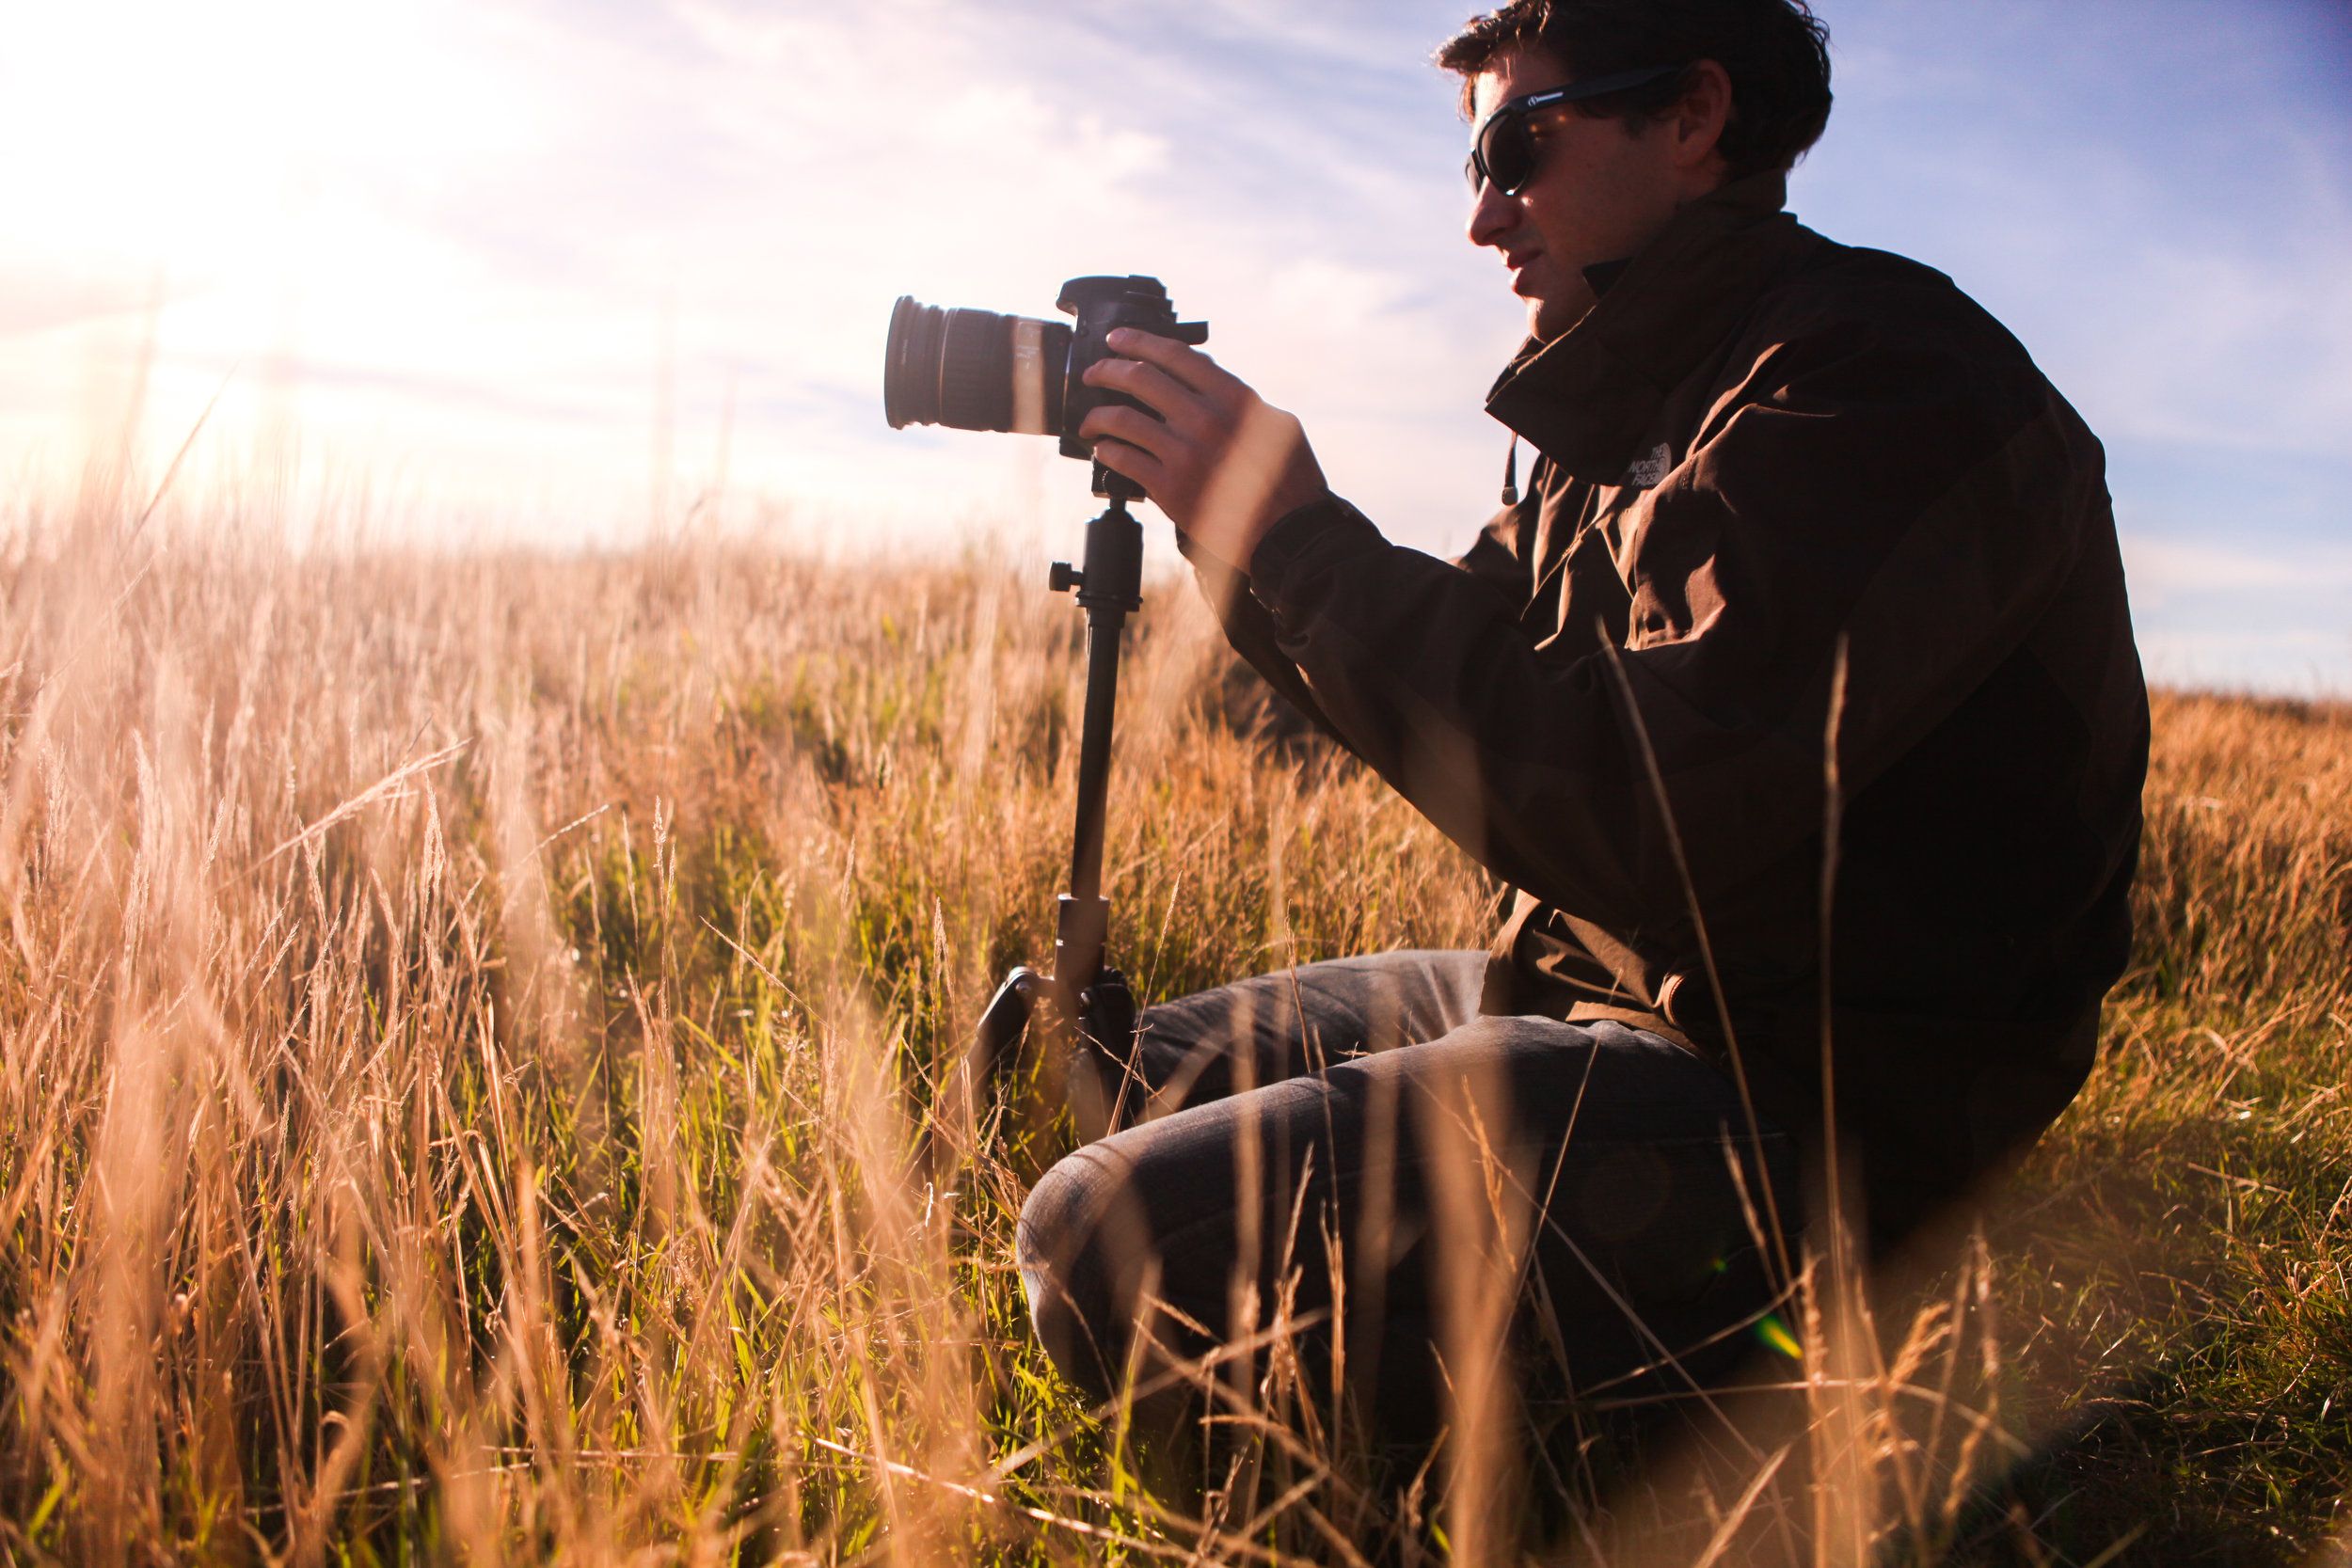 wandering_study_adventure_videographer_new_zealand_waipapa_camera